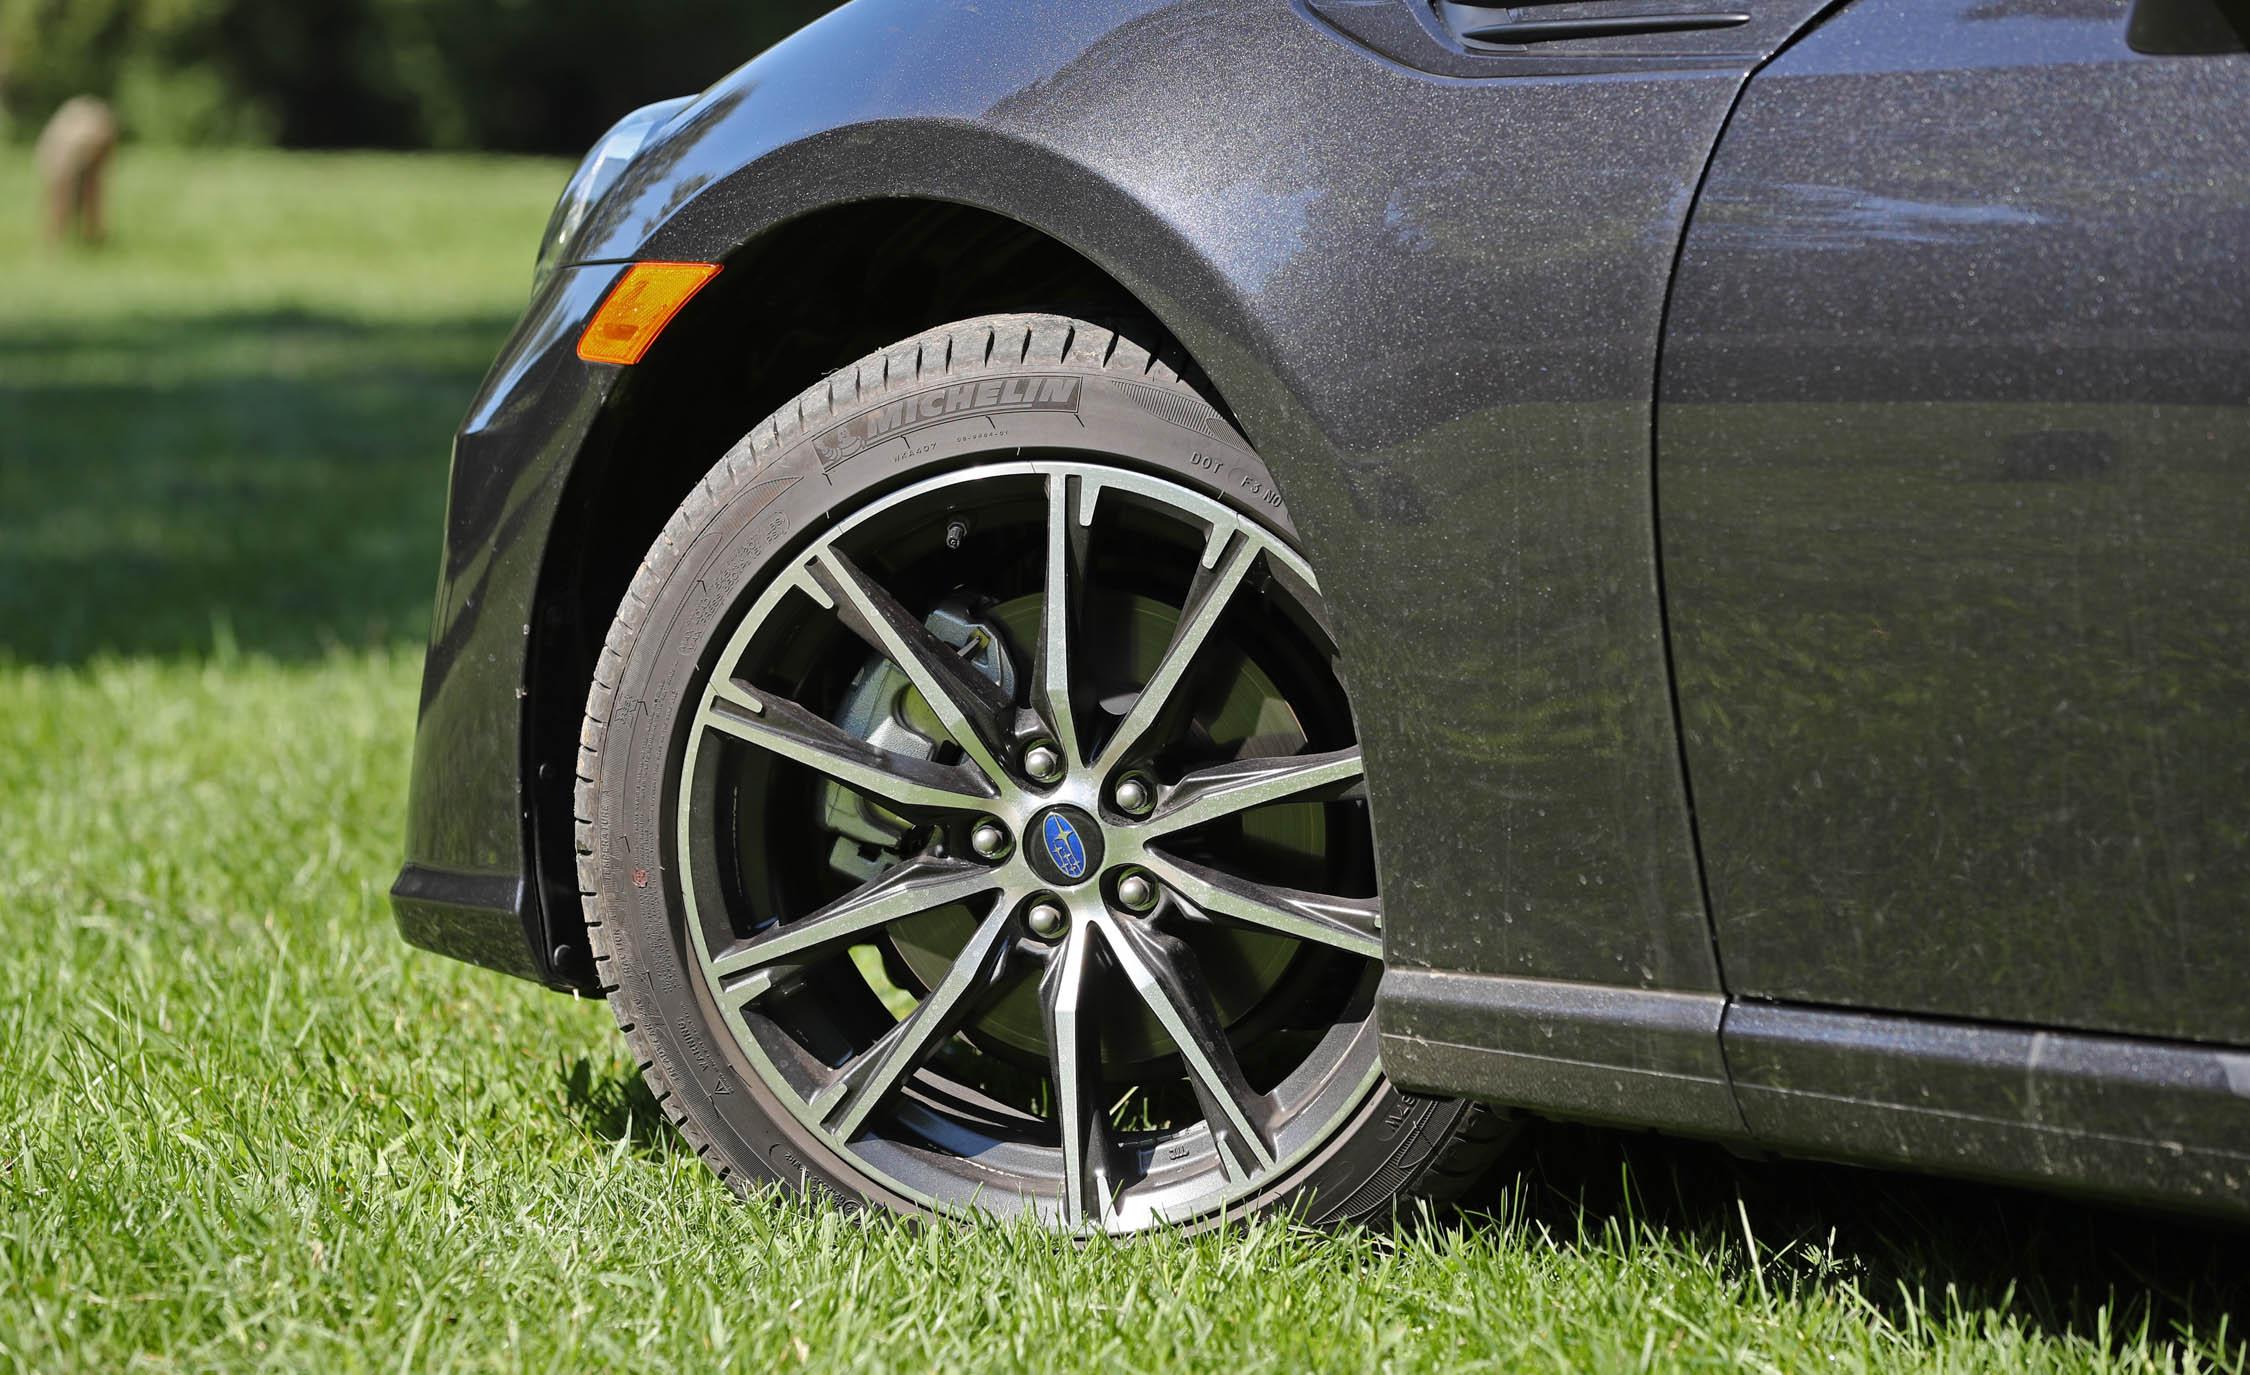 2017 Subaru BRZ Exterior View Wheel Profile (Photo 16 of 27)